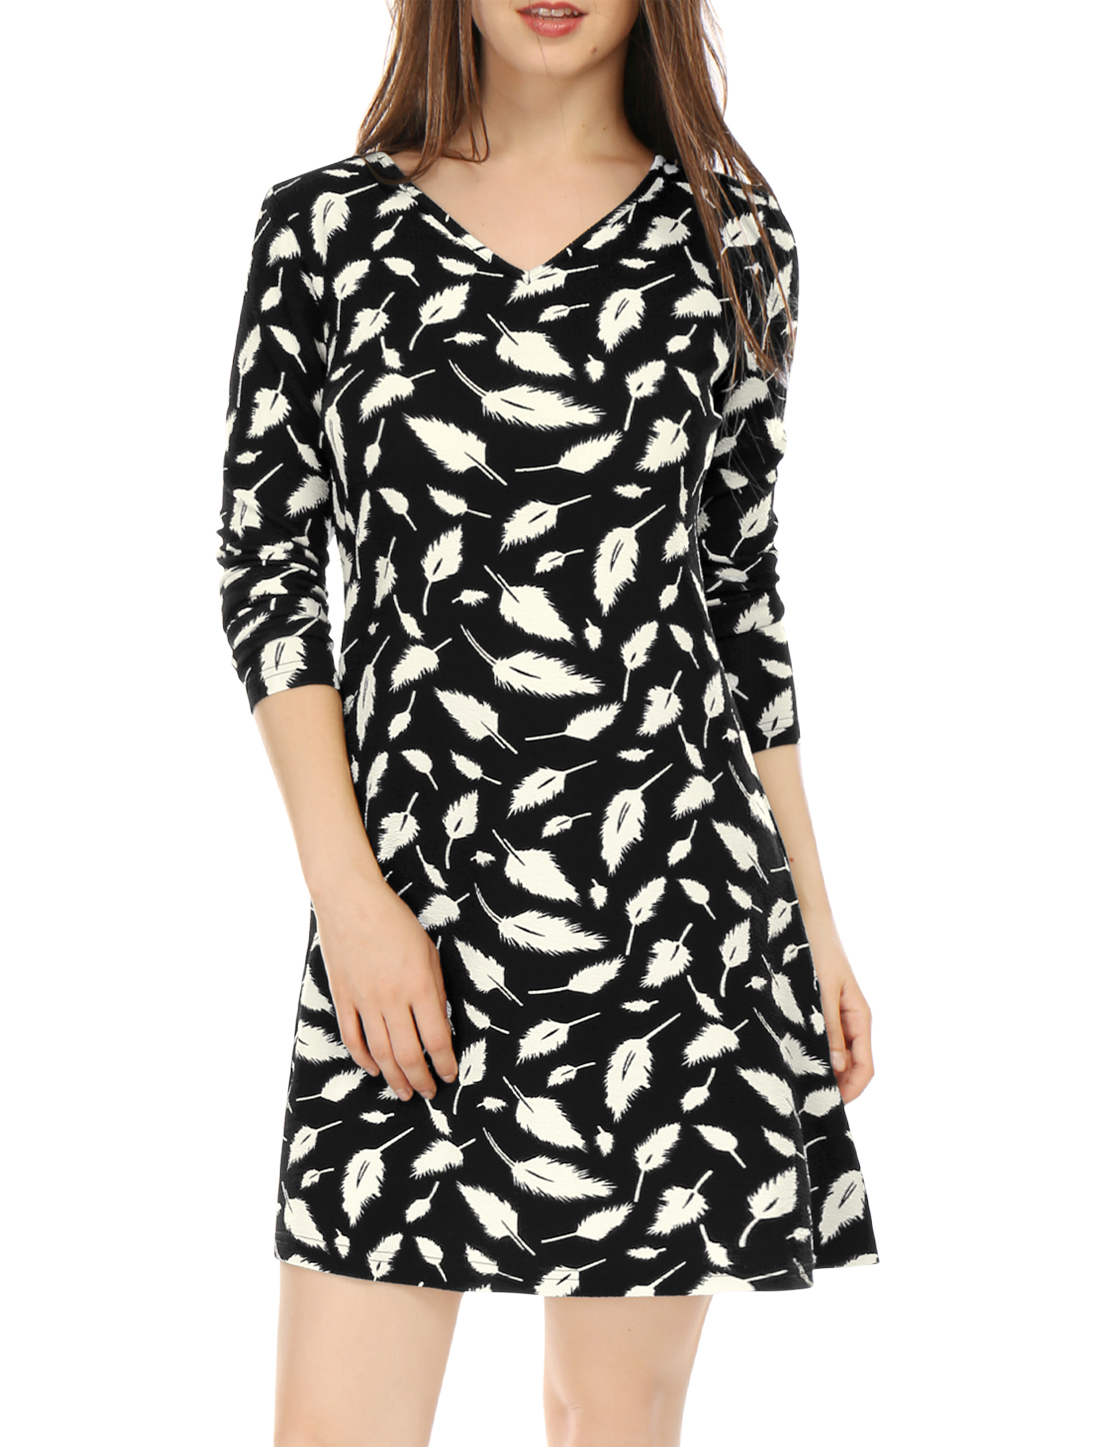 Women V Neck Long Sleeves Feather Print Mini Dress Black XS